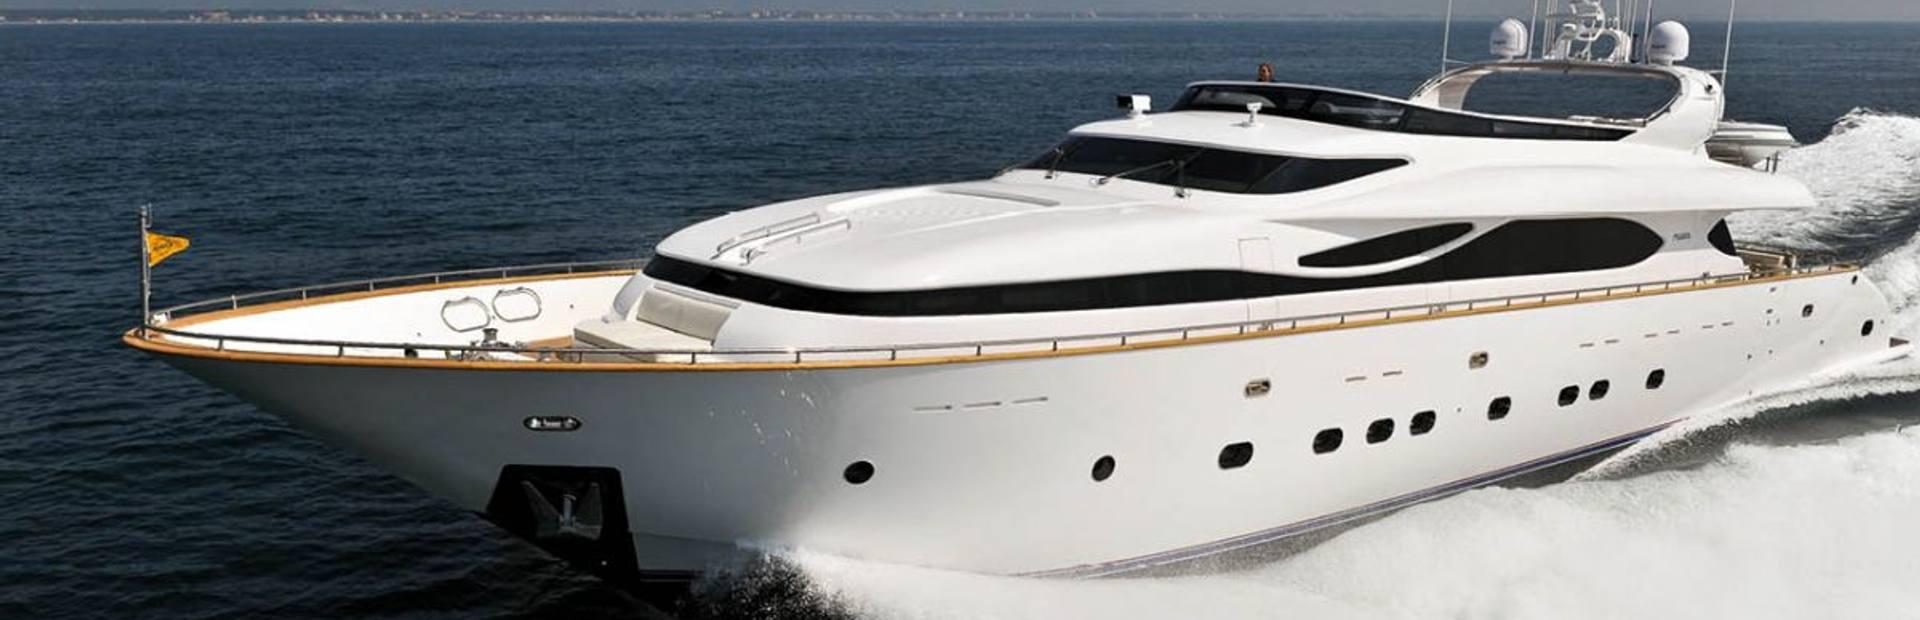 Maiora 35DP Yacht Charter